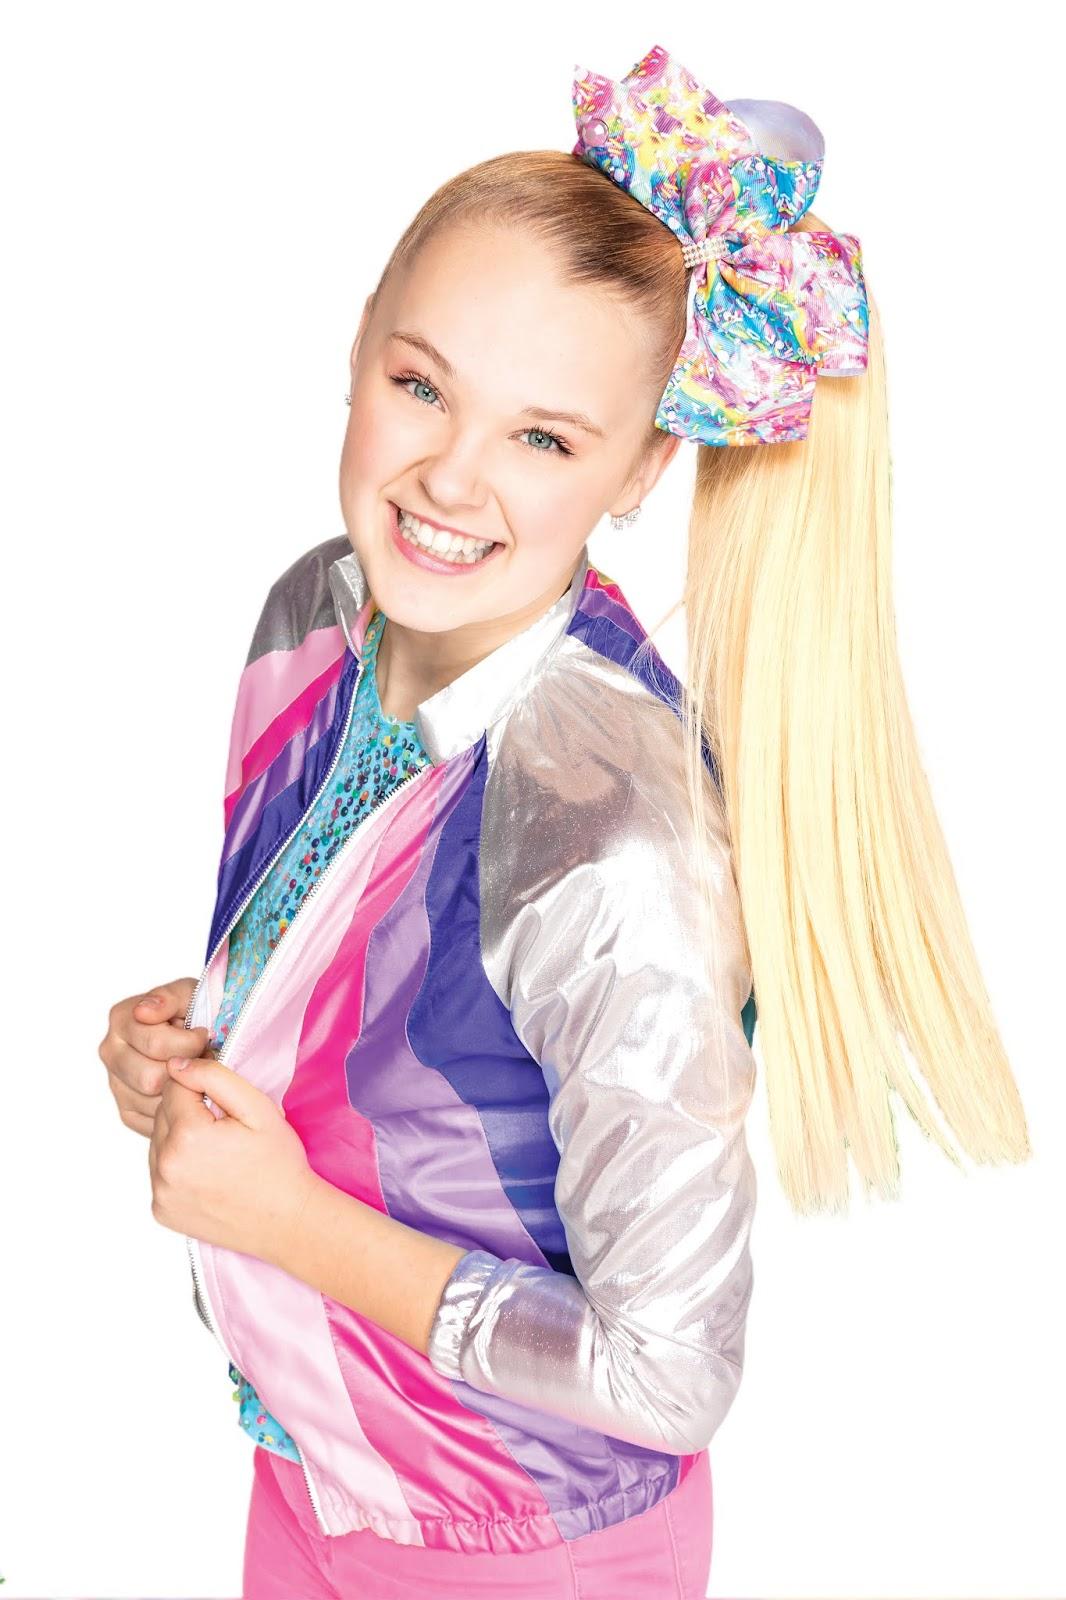 Nickalive Nickelodeon S Jojo Siwa D R E A M The Tour